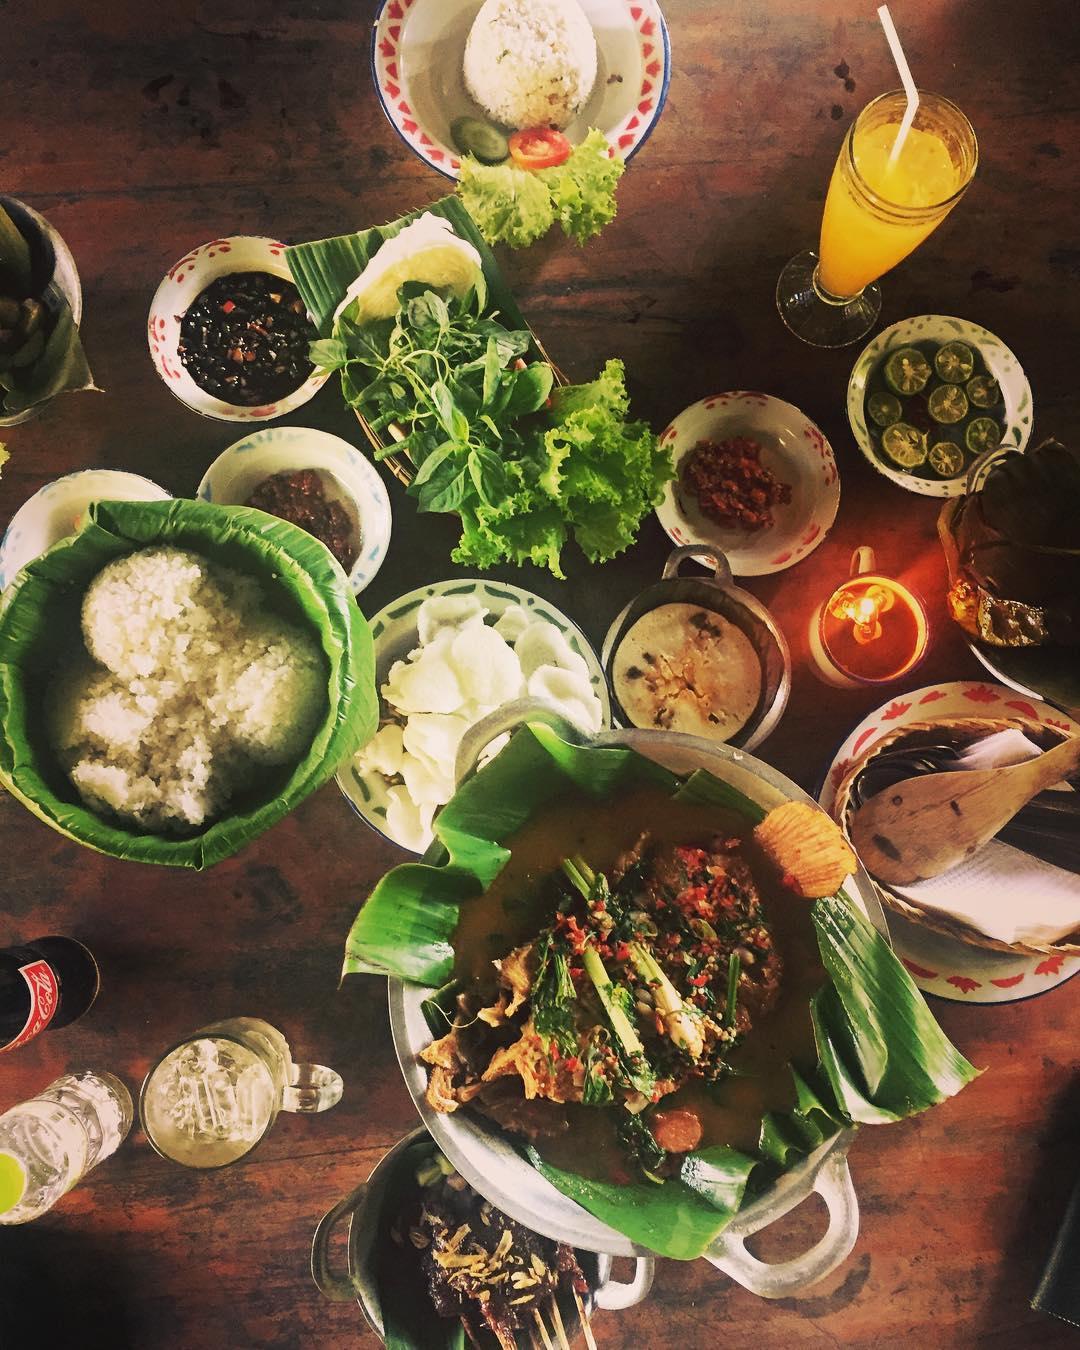 Sapu Lidi Resort, Sapu Lidi, Sapu Lidi Bandung, Bandung, Kota Bandung, Dolan Dolen Sapu Lidi Resort via chrizbellamy - Dolan Dolen